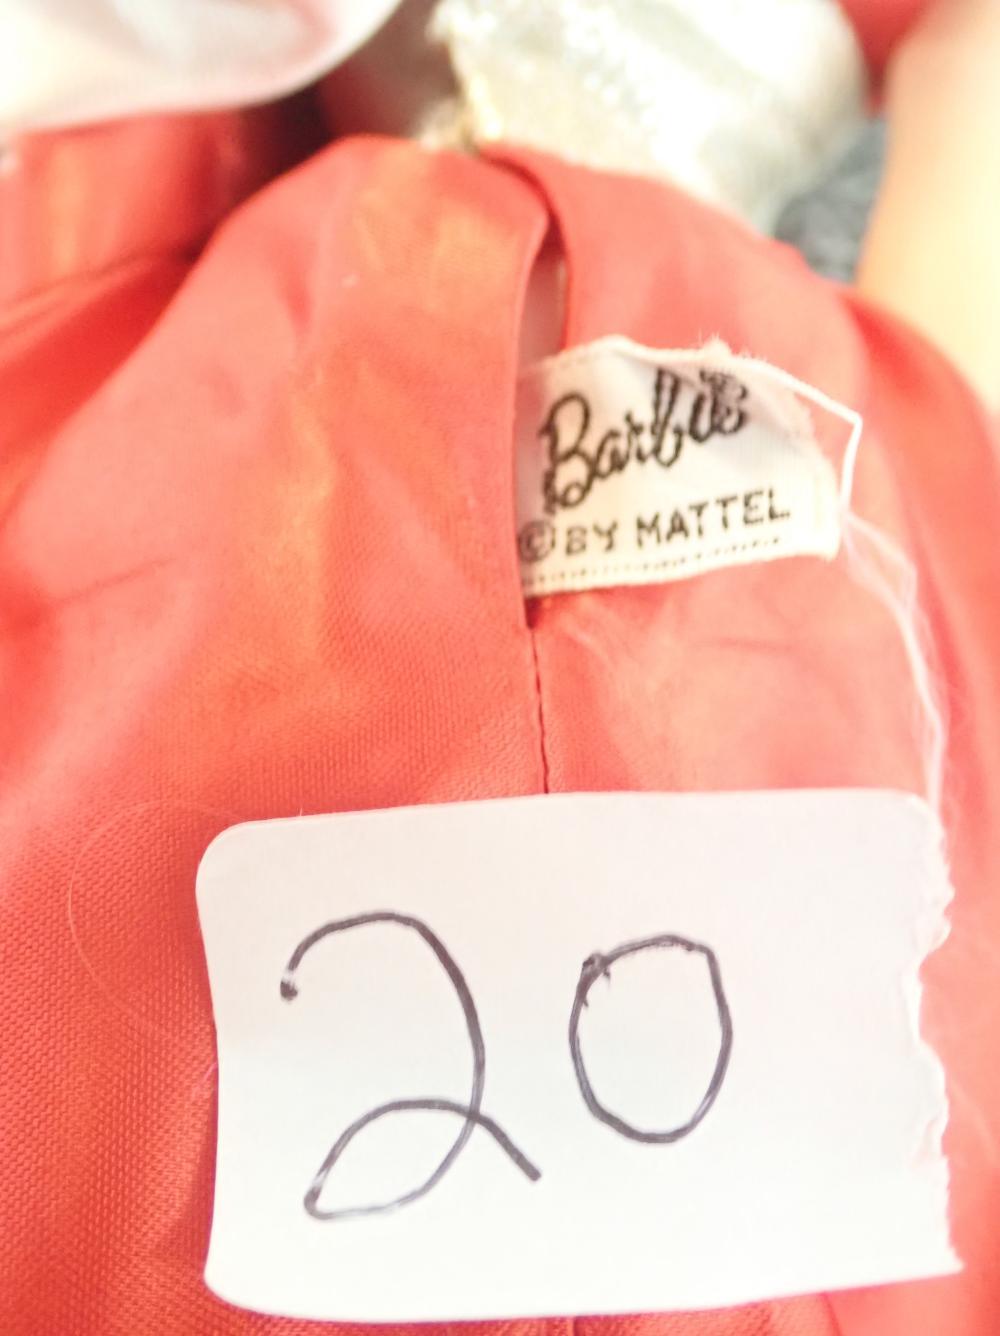 MIDGE 1962 BARBIE 1958 BY MATTEL INC US PENDING TAIWAN PATENT - HAS EYE LASHES - ORIGINAL CLOTHES